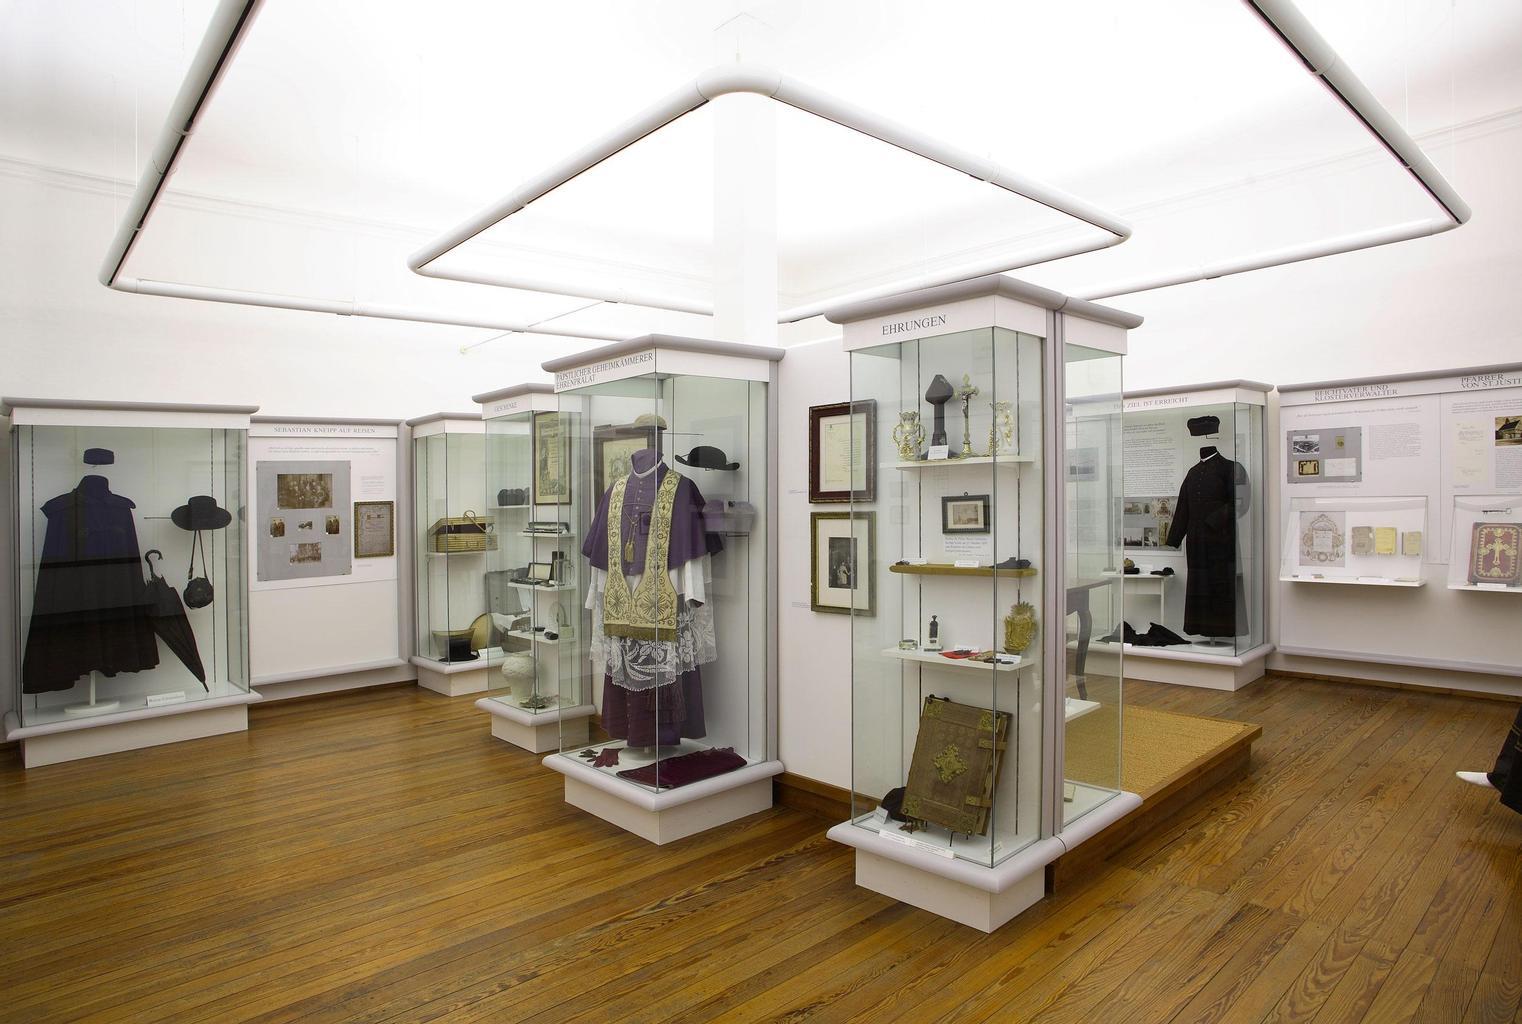 Sebastian-Kneipp-Museum